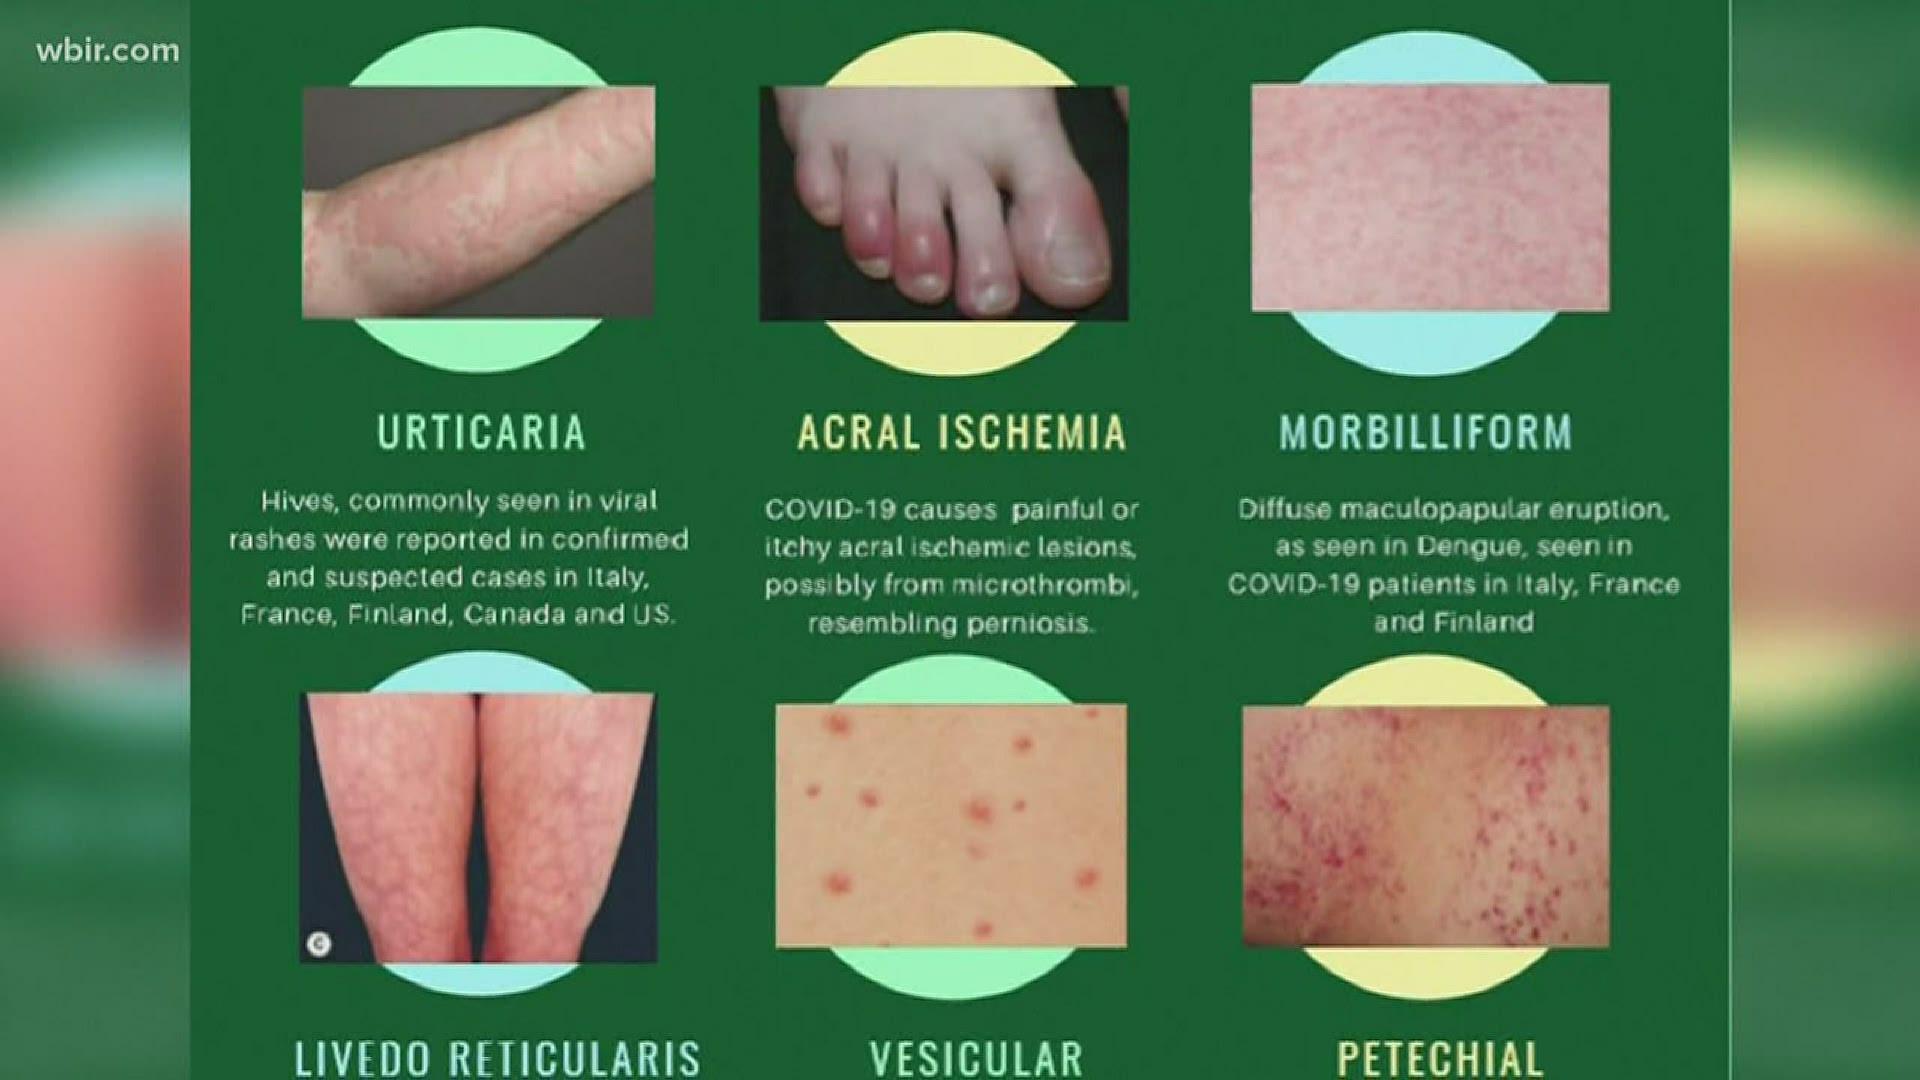 Doctor Skin Rash Could Be A Symptom As Possible Covid 19 Symptom Localmemphis Com